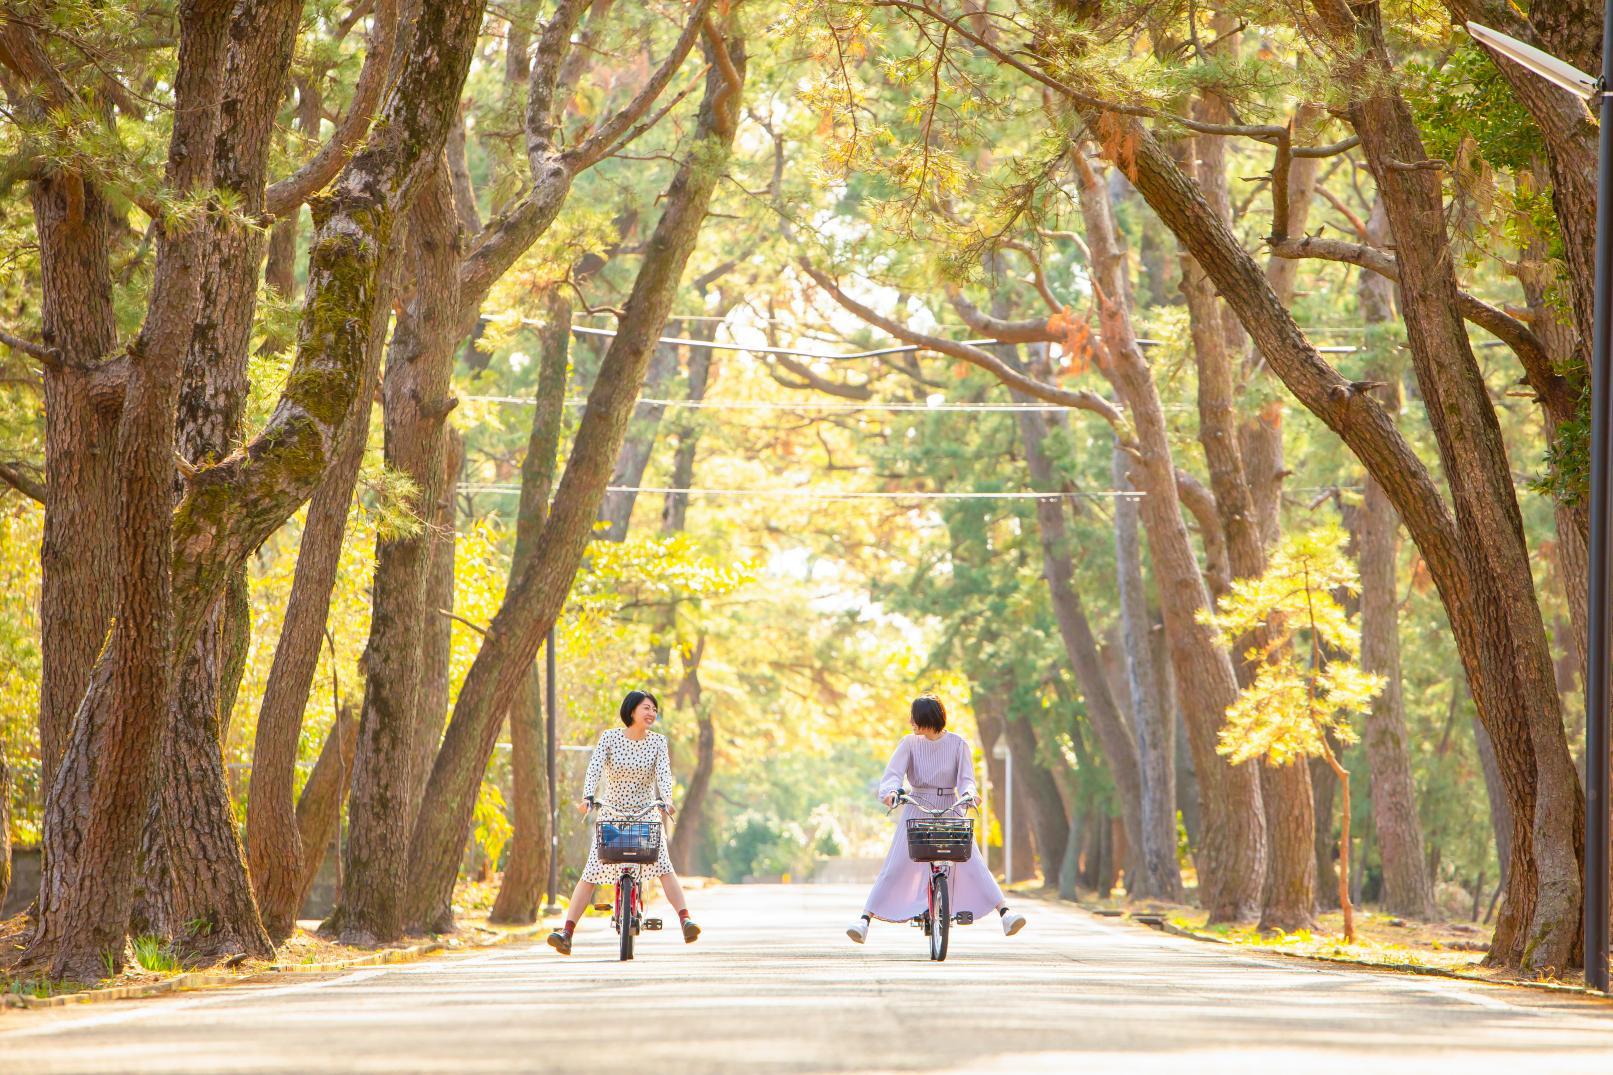 Avenue of Pines - Hime no Matsubara-1